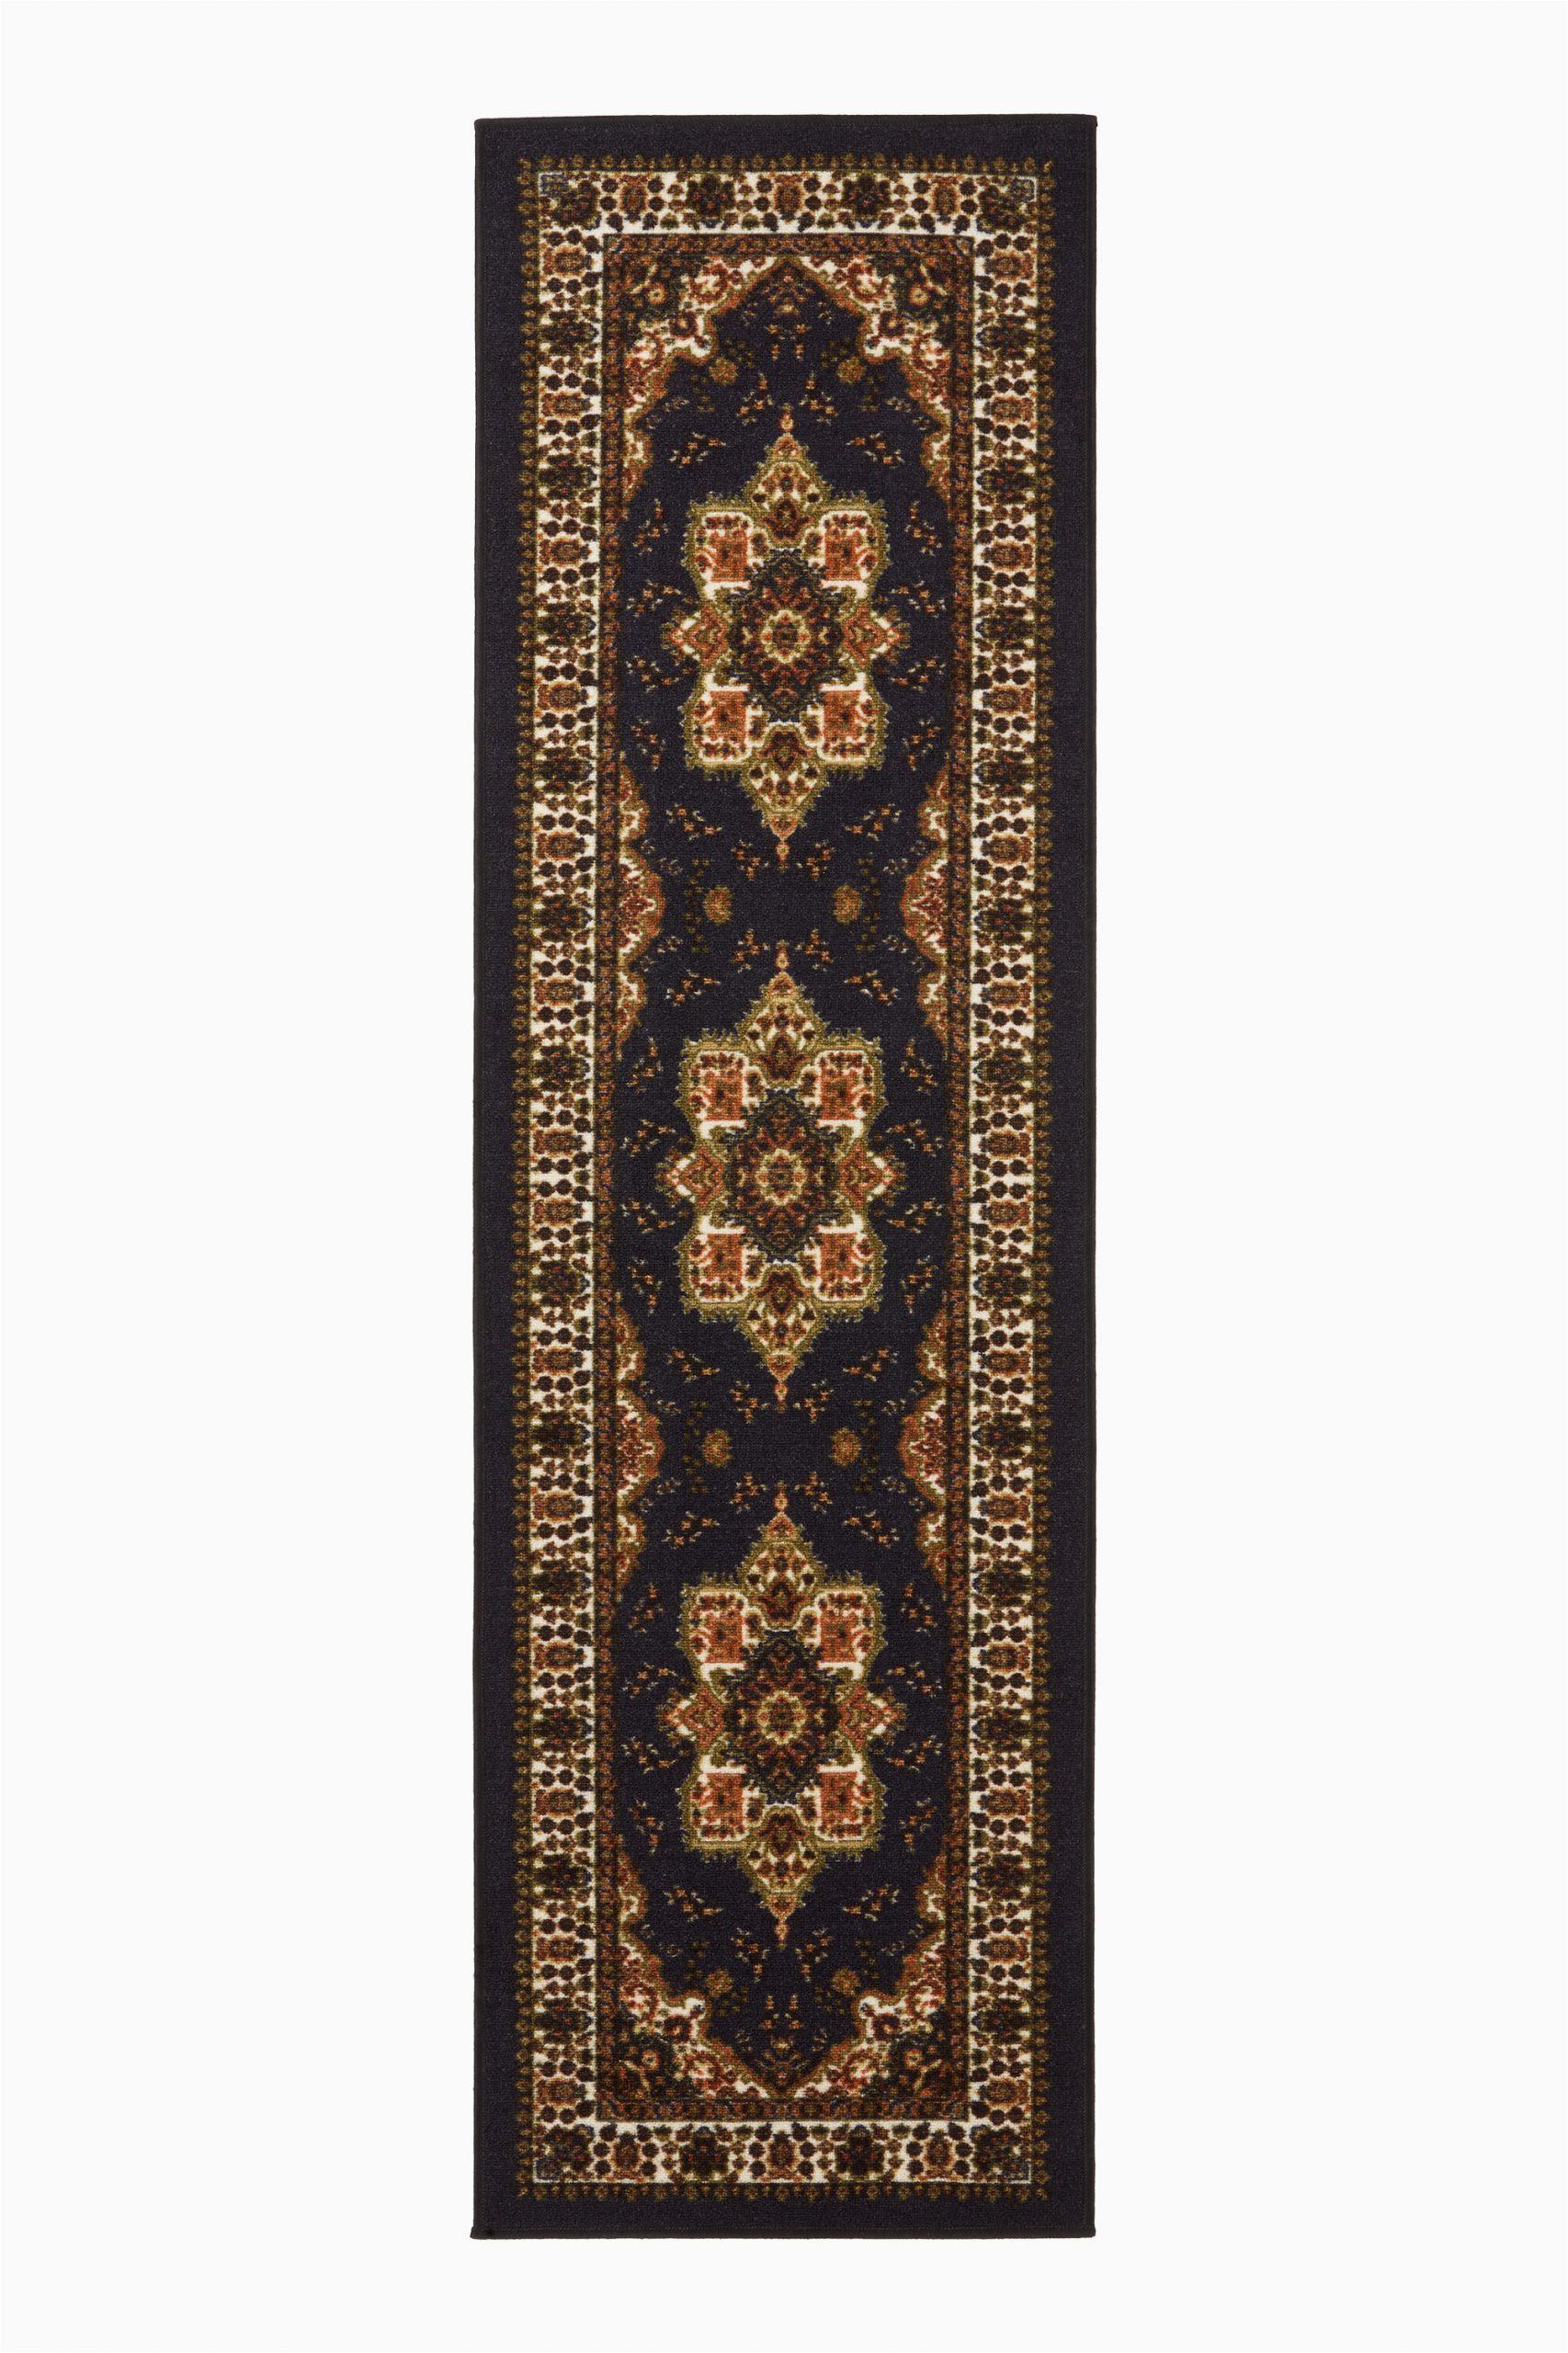 fleur de lis living maone oriental blackbrown area rug w003404932piid1544427125